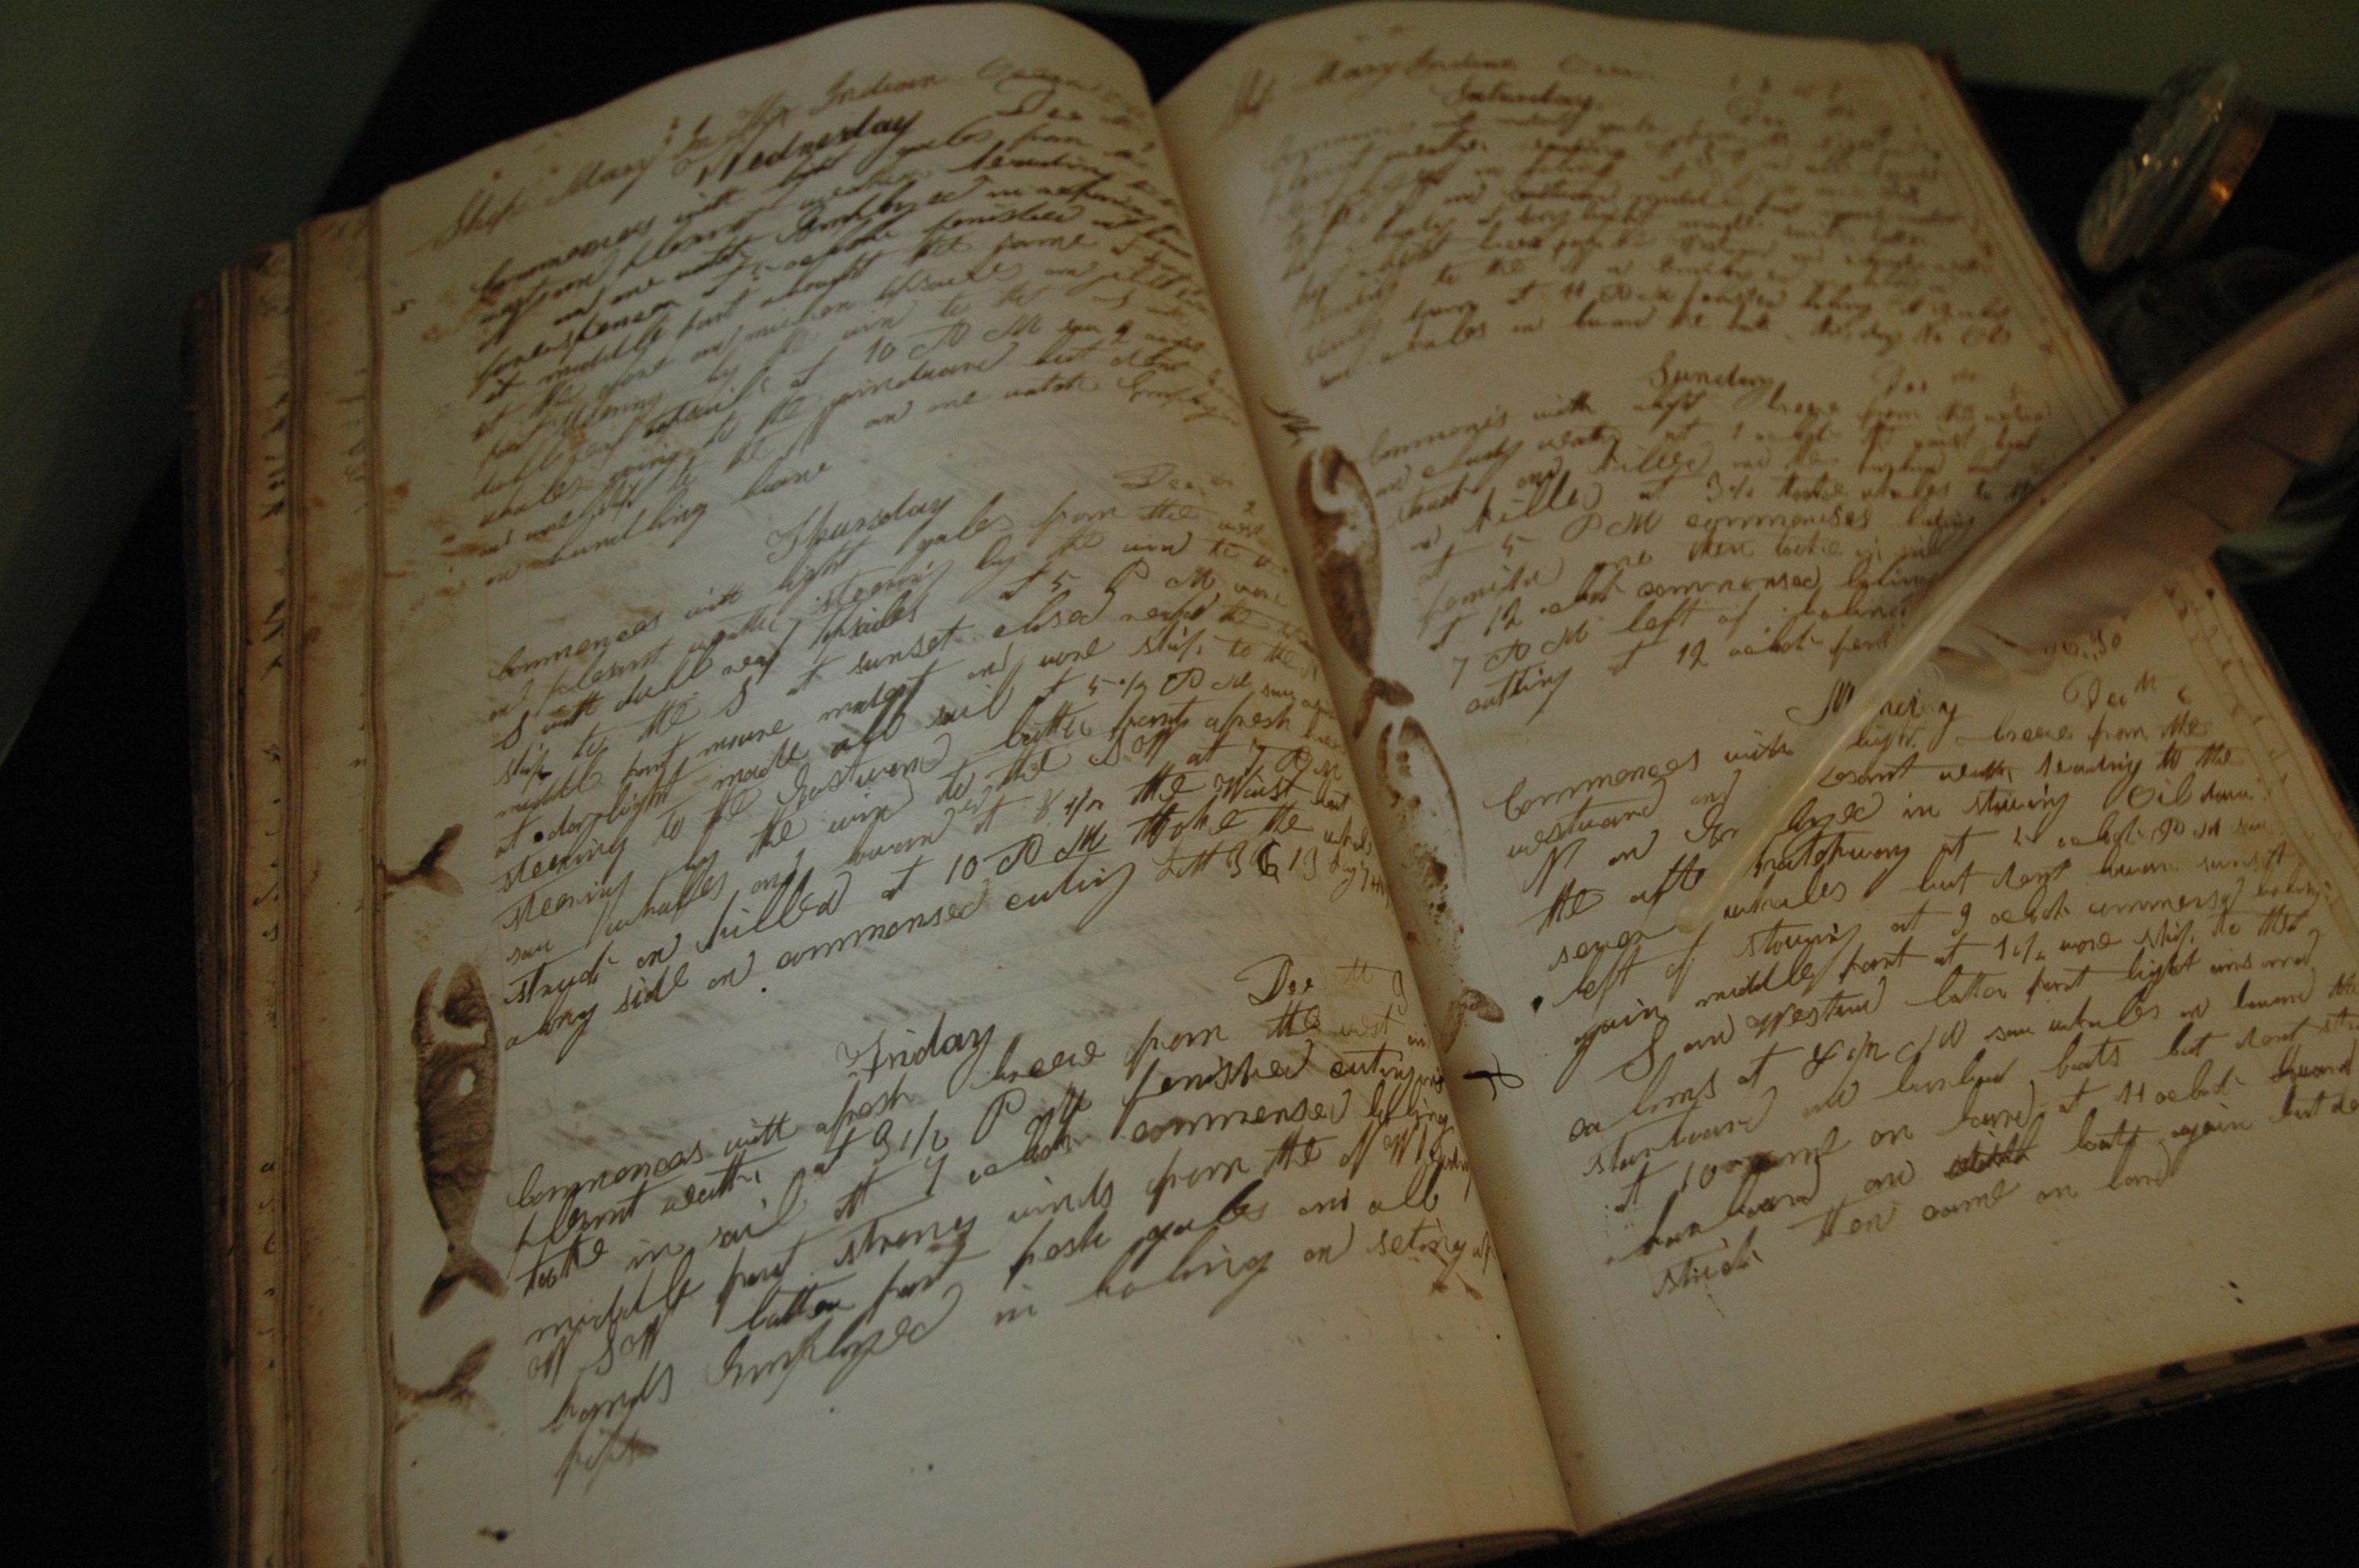 whaling log book.JPG